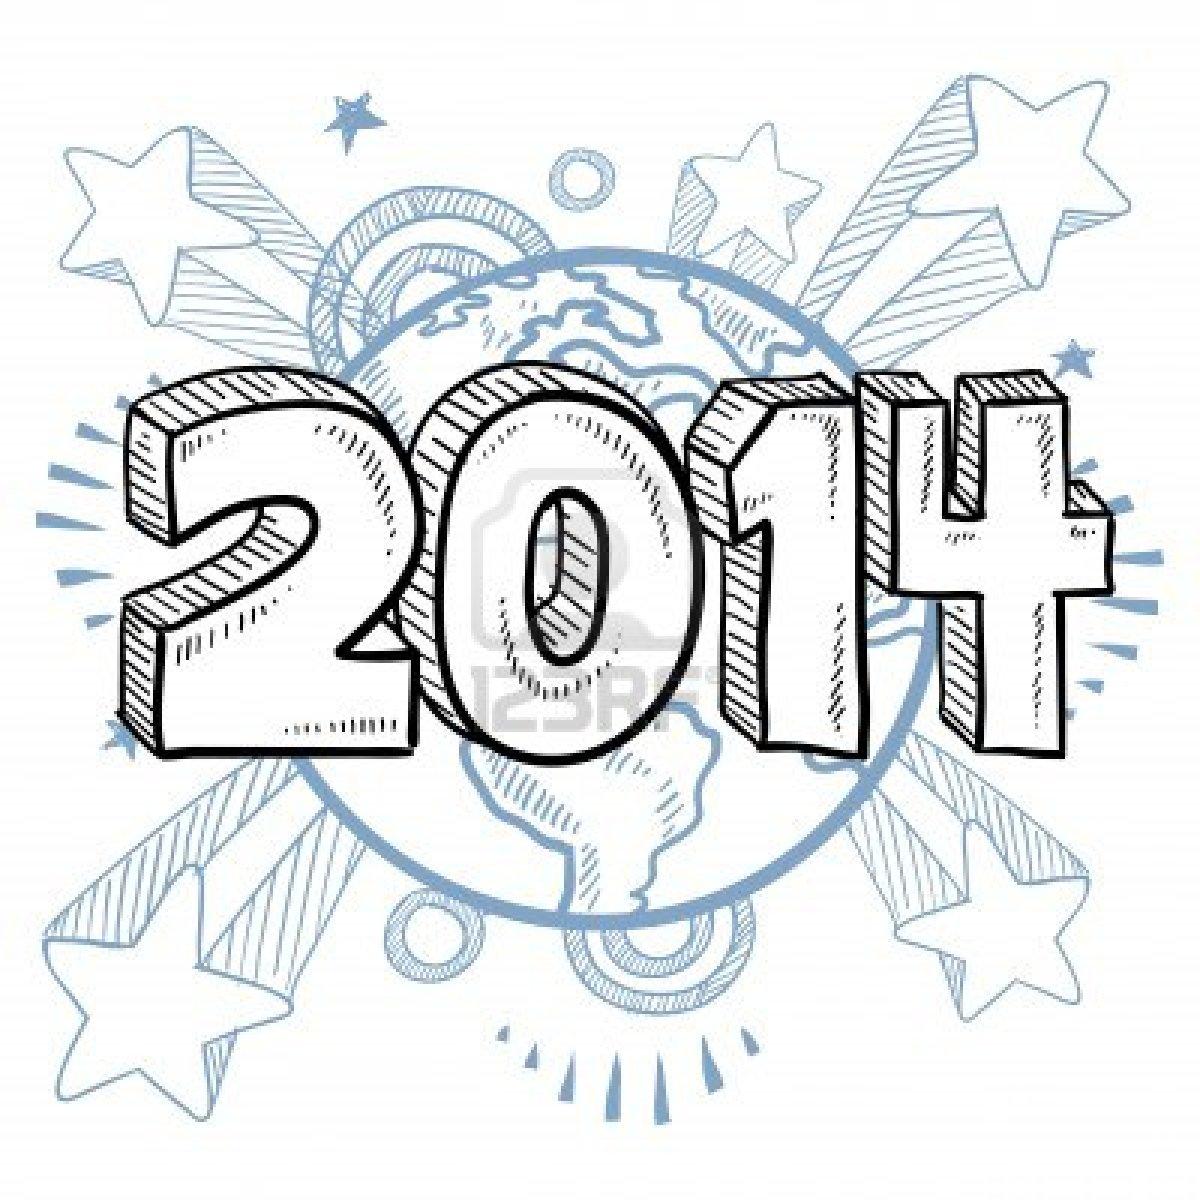 ���� ��� ��� ����� ��������� 2014 , ��� ������ ��� ����� 2014